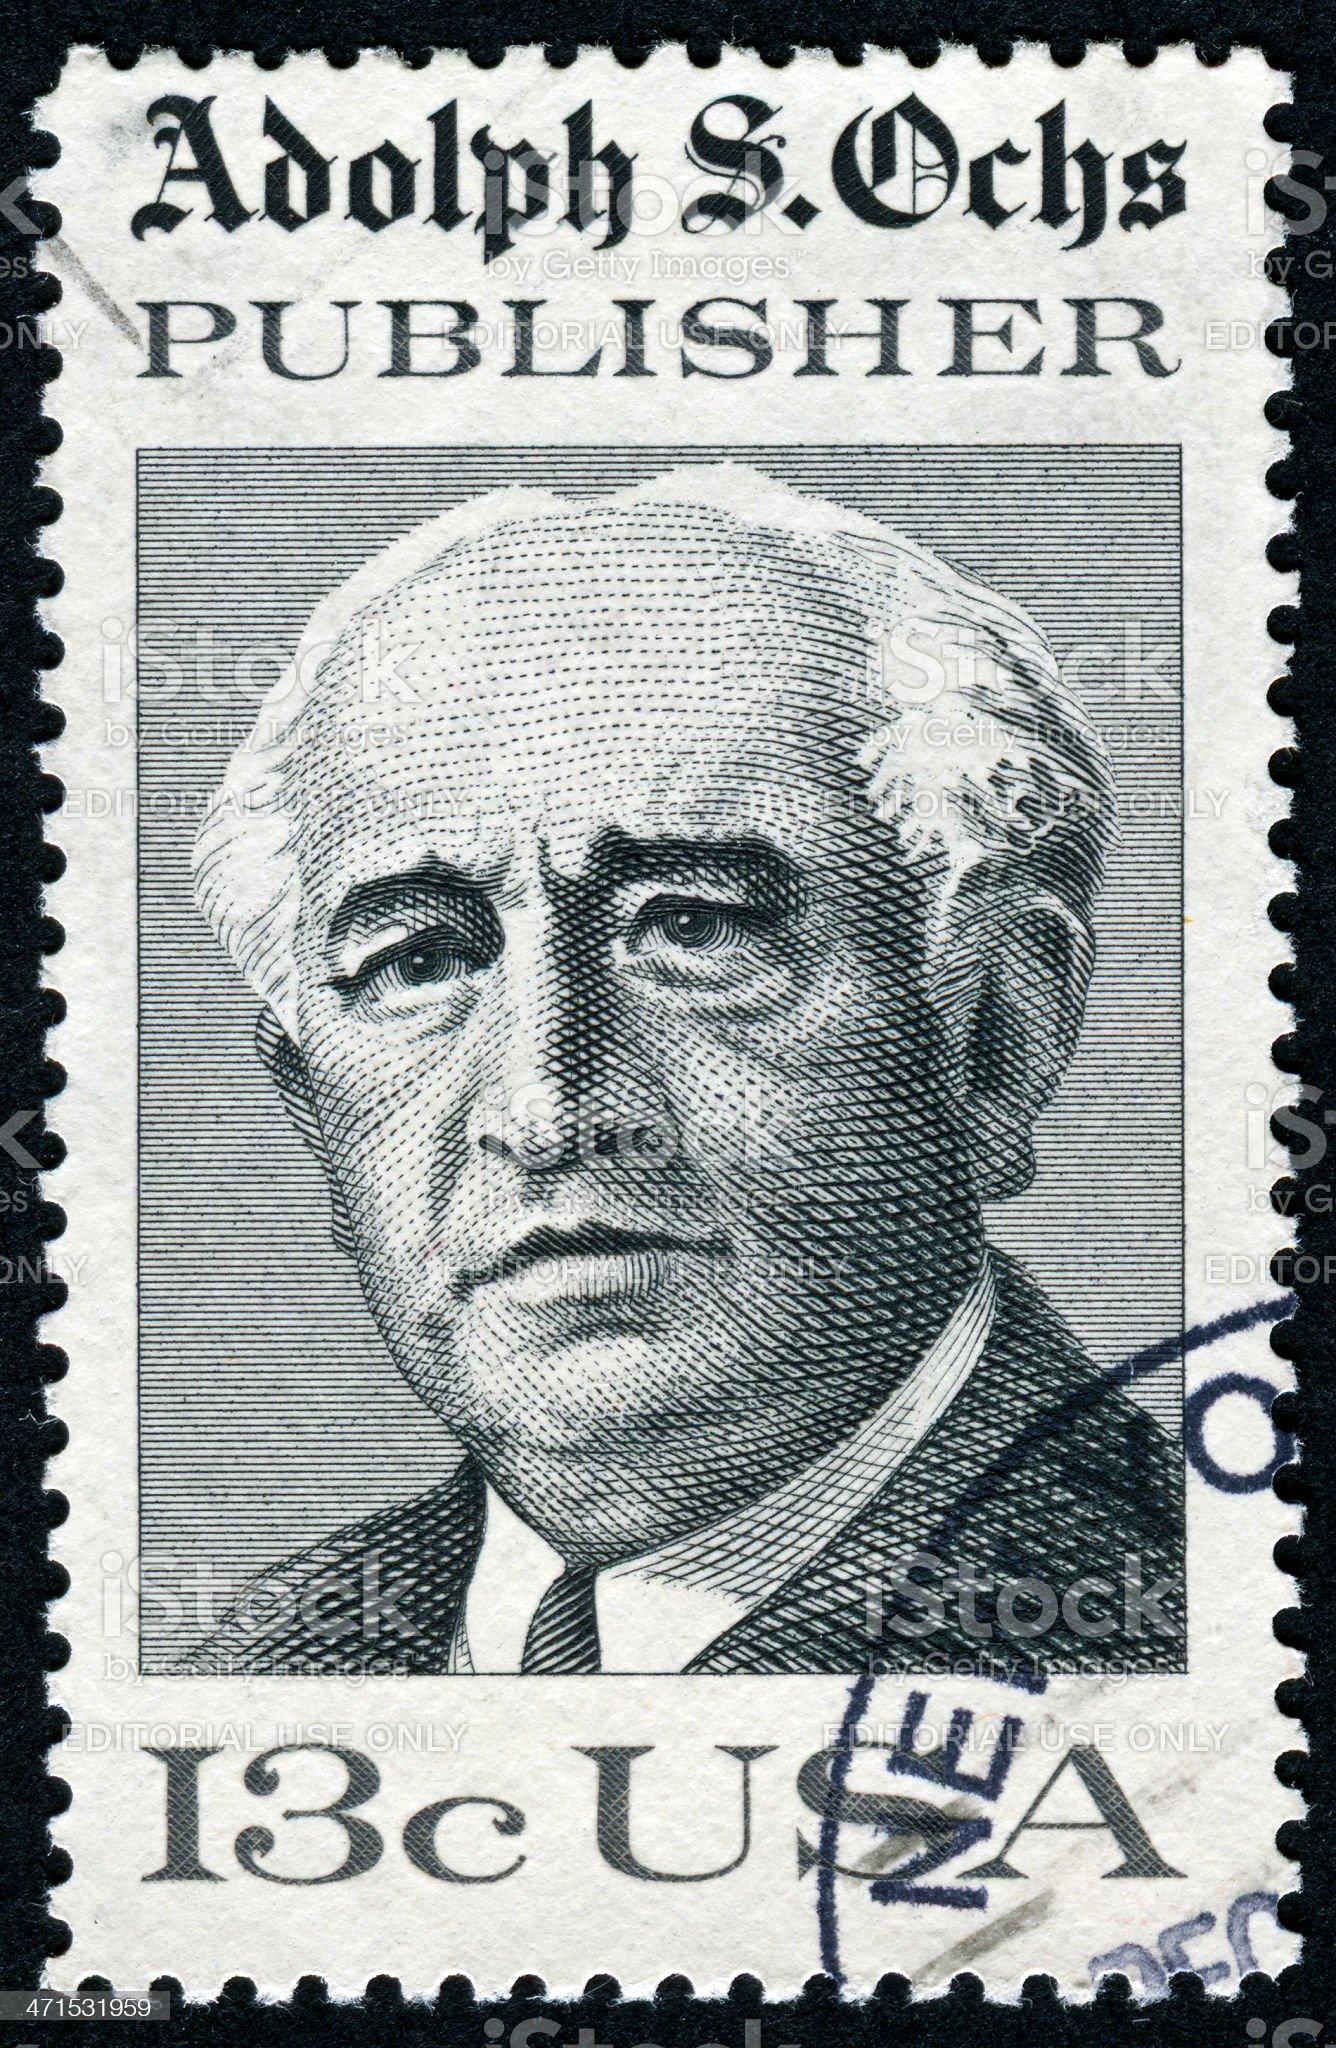 Adolph S. Ochs Stamp royalty-free stock photo